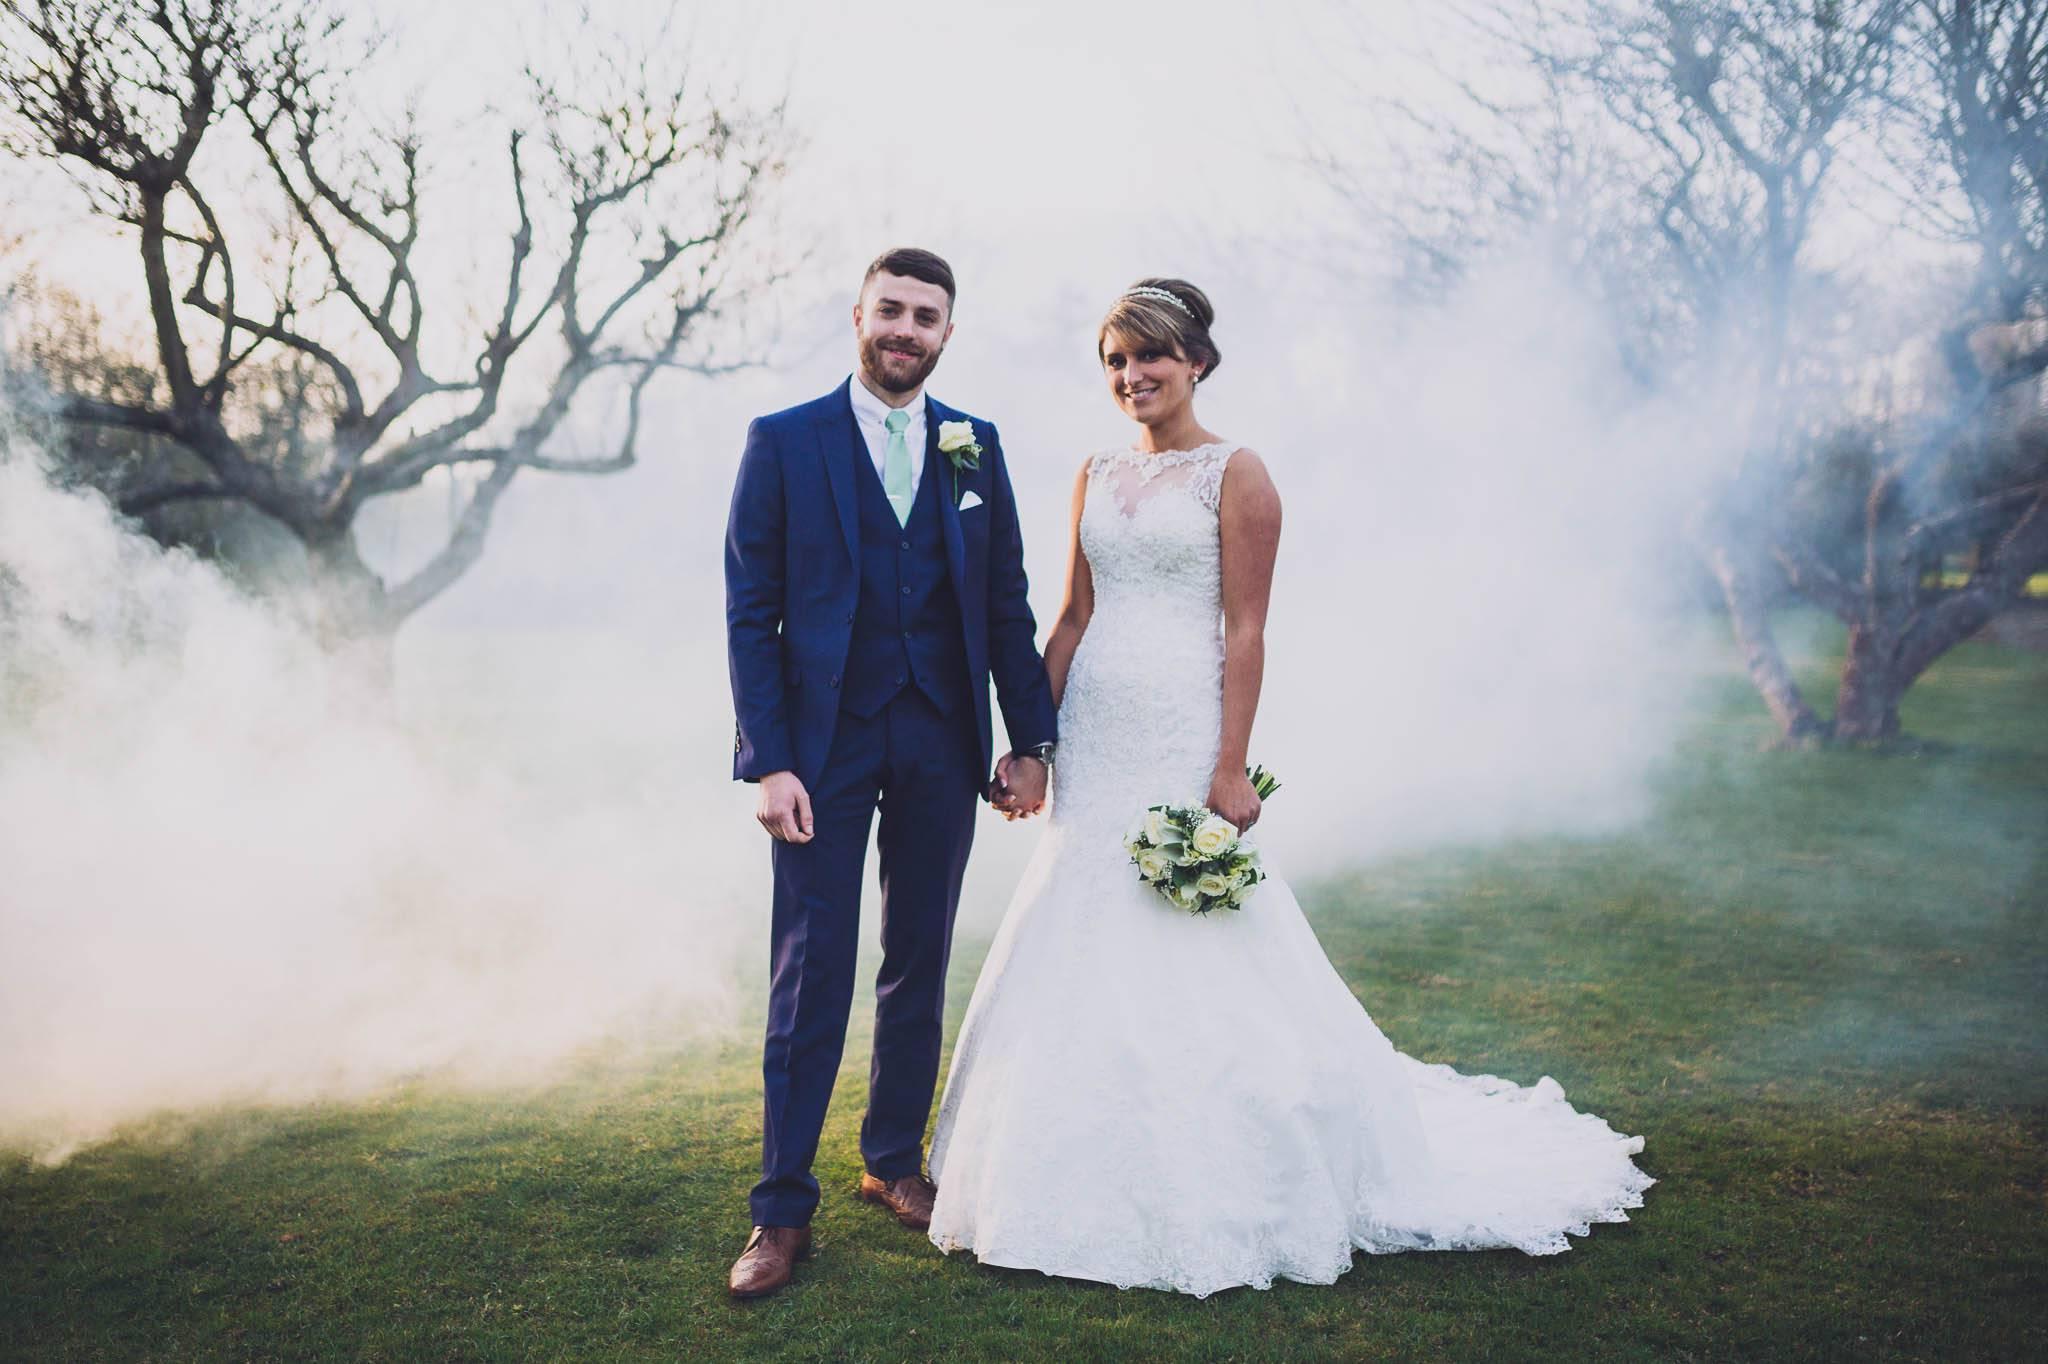 warwickshire-wedding-photographer 16.jpg